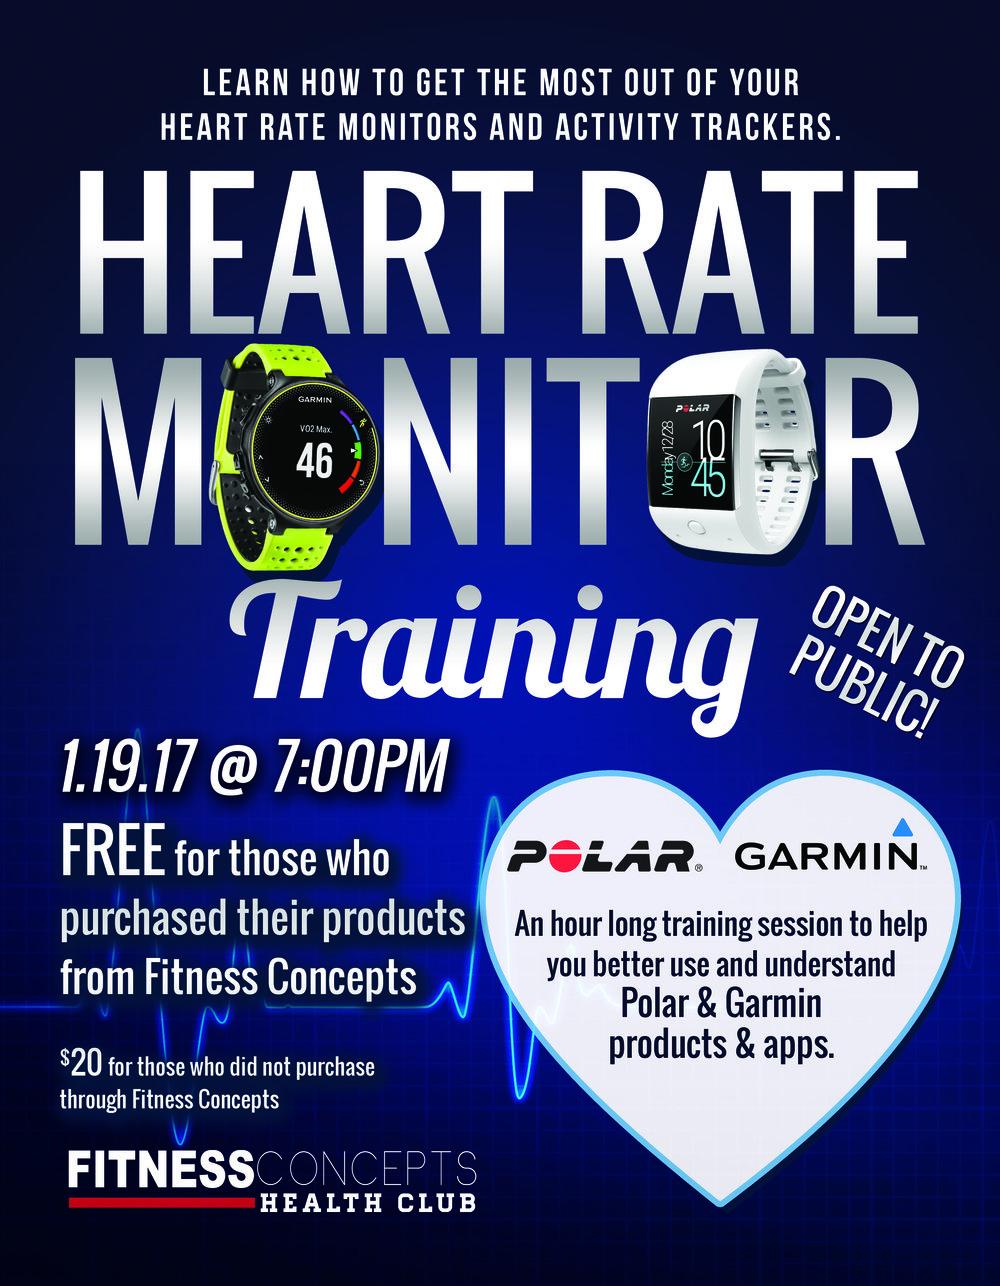 heartrate_monitor_training.jpg